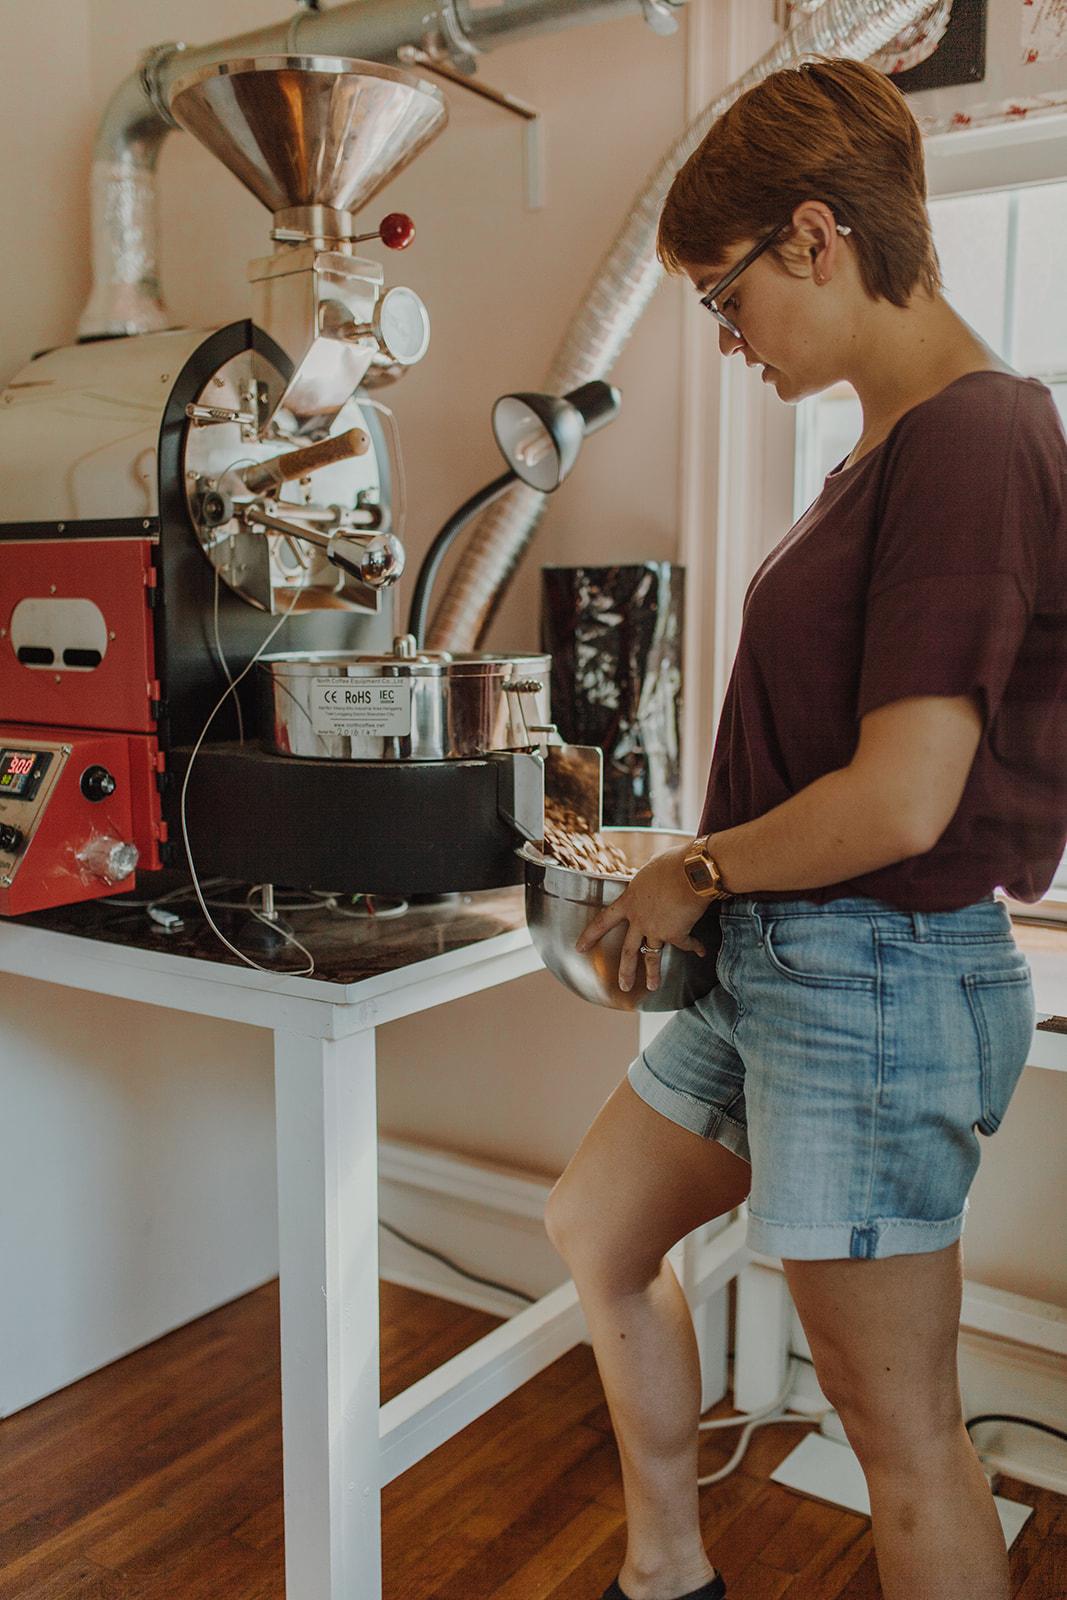 Mill city coffee roasting machine